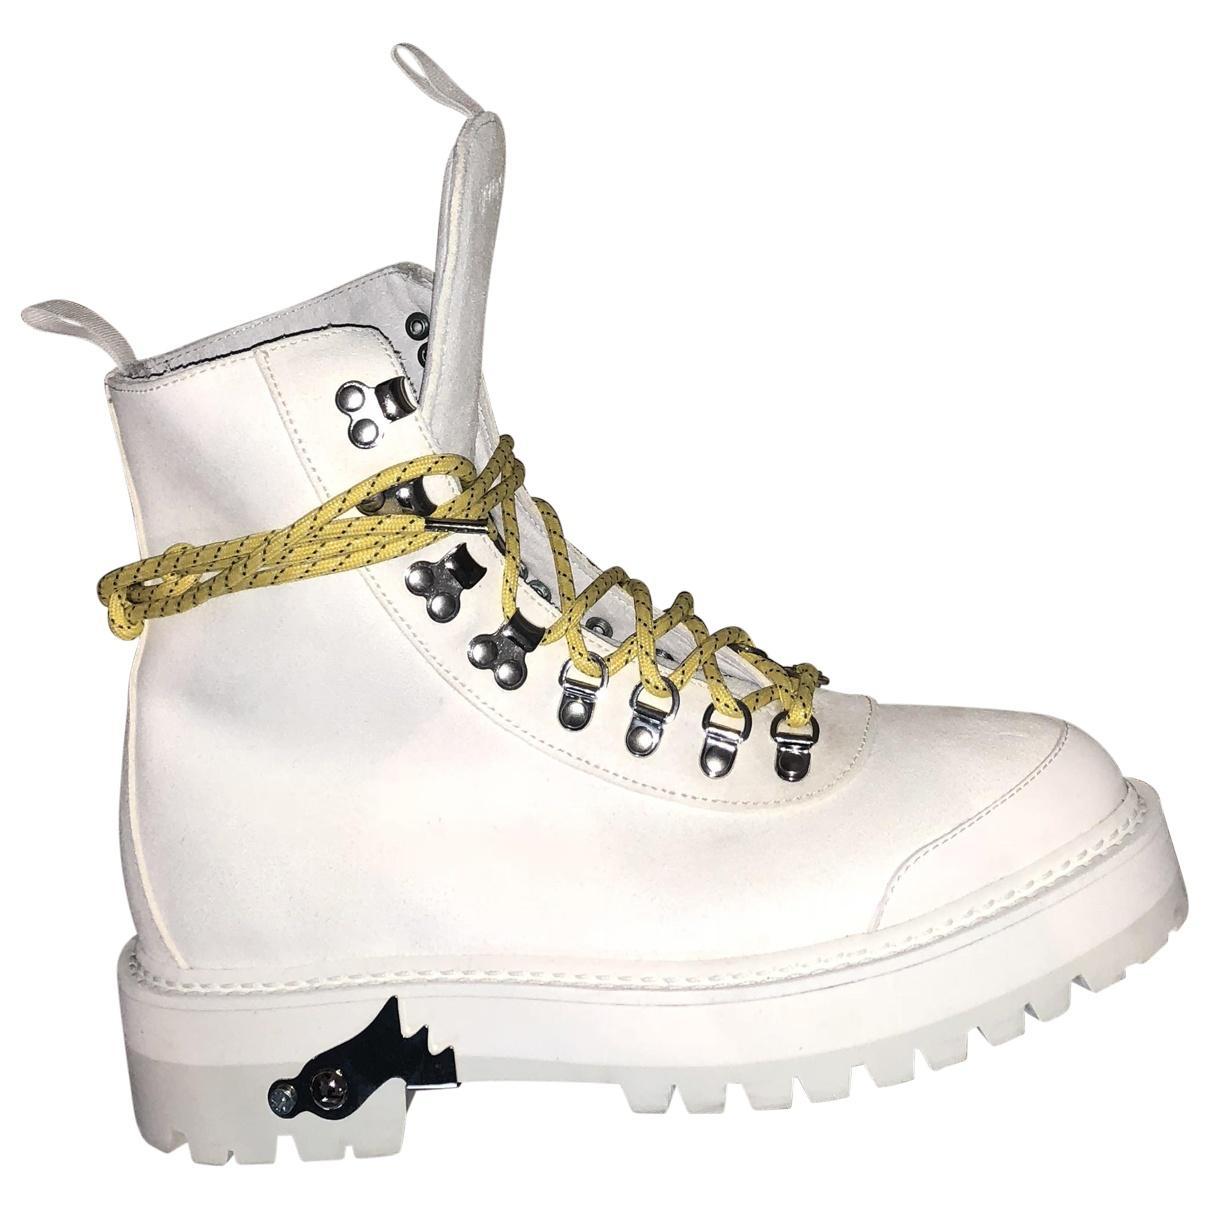 Off-White c/o Virgil Abloh Snow Boots